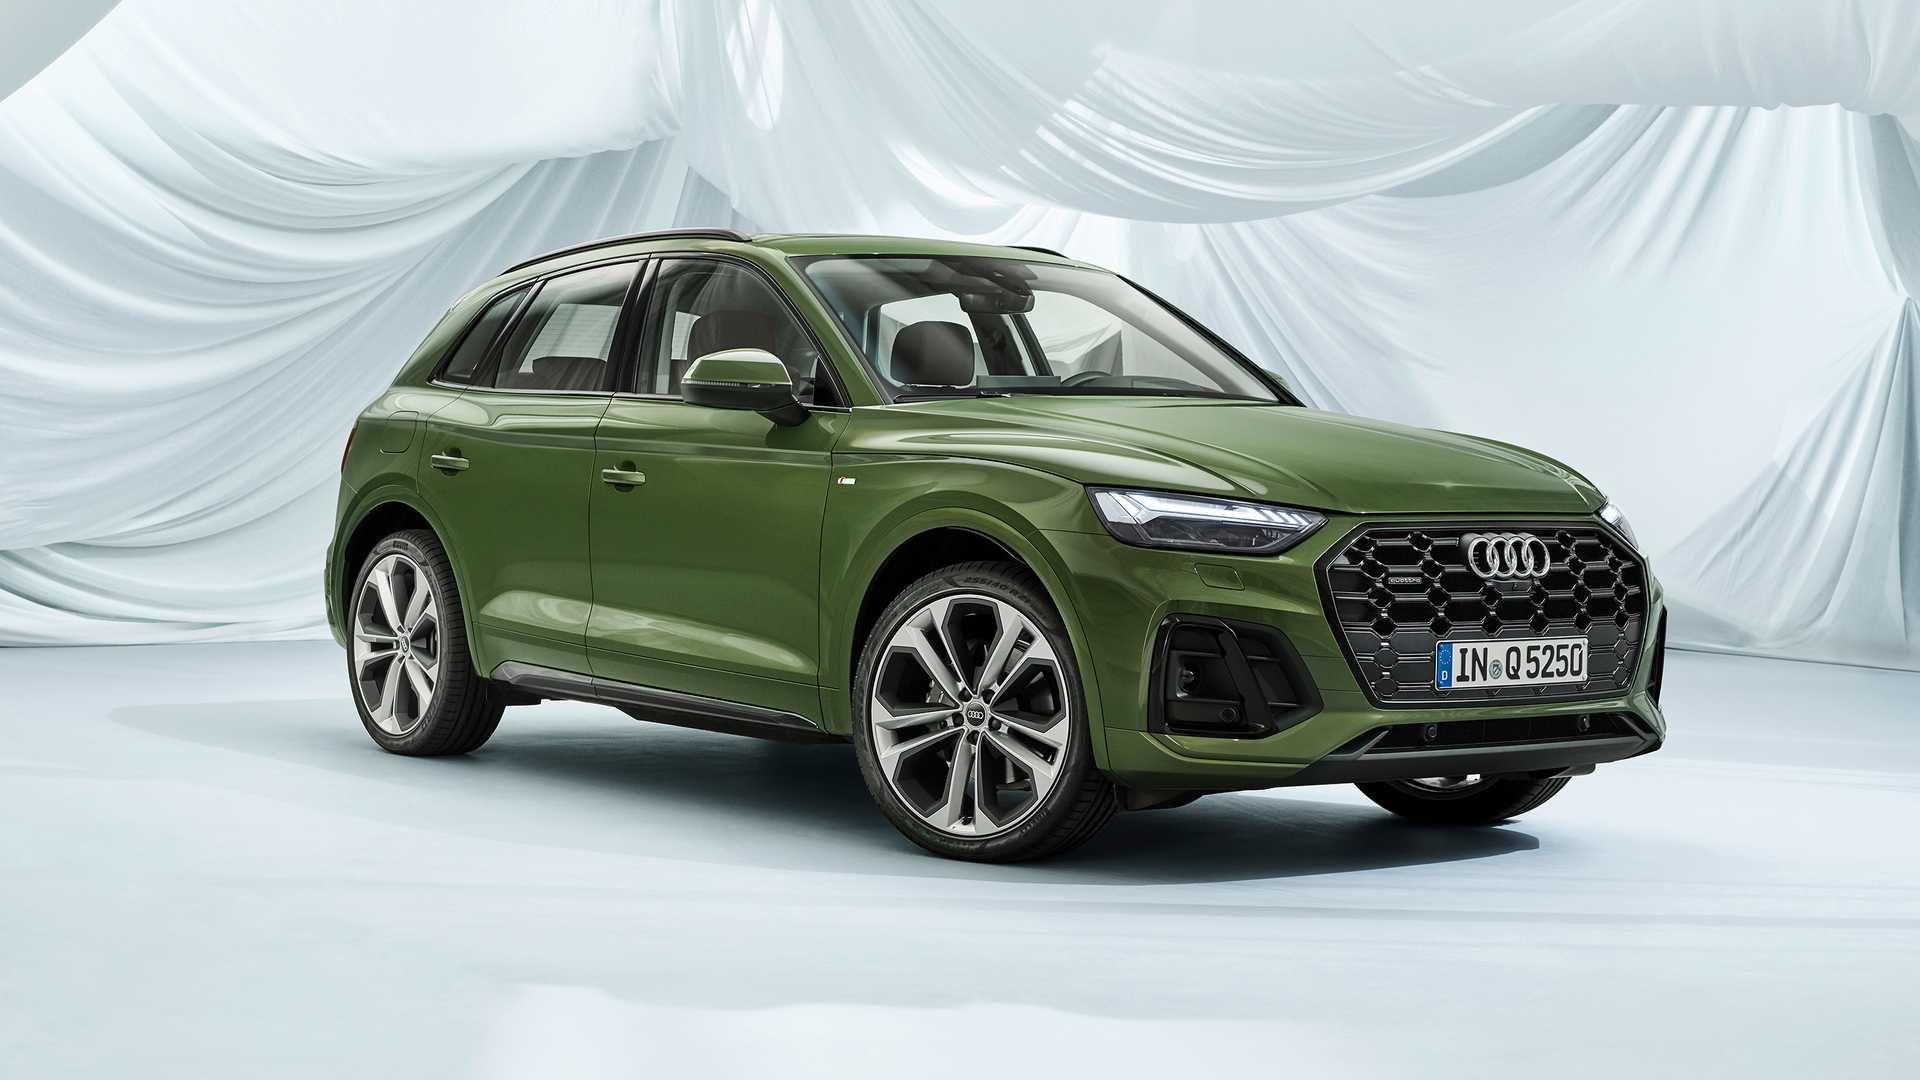 2021 Audi Q5 Facelift In 2020 Audi Tdi Audi Audi Q5